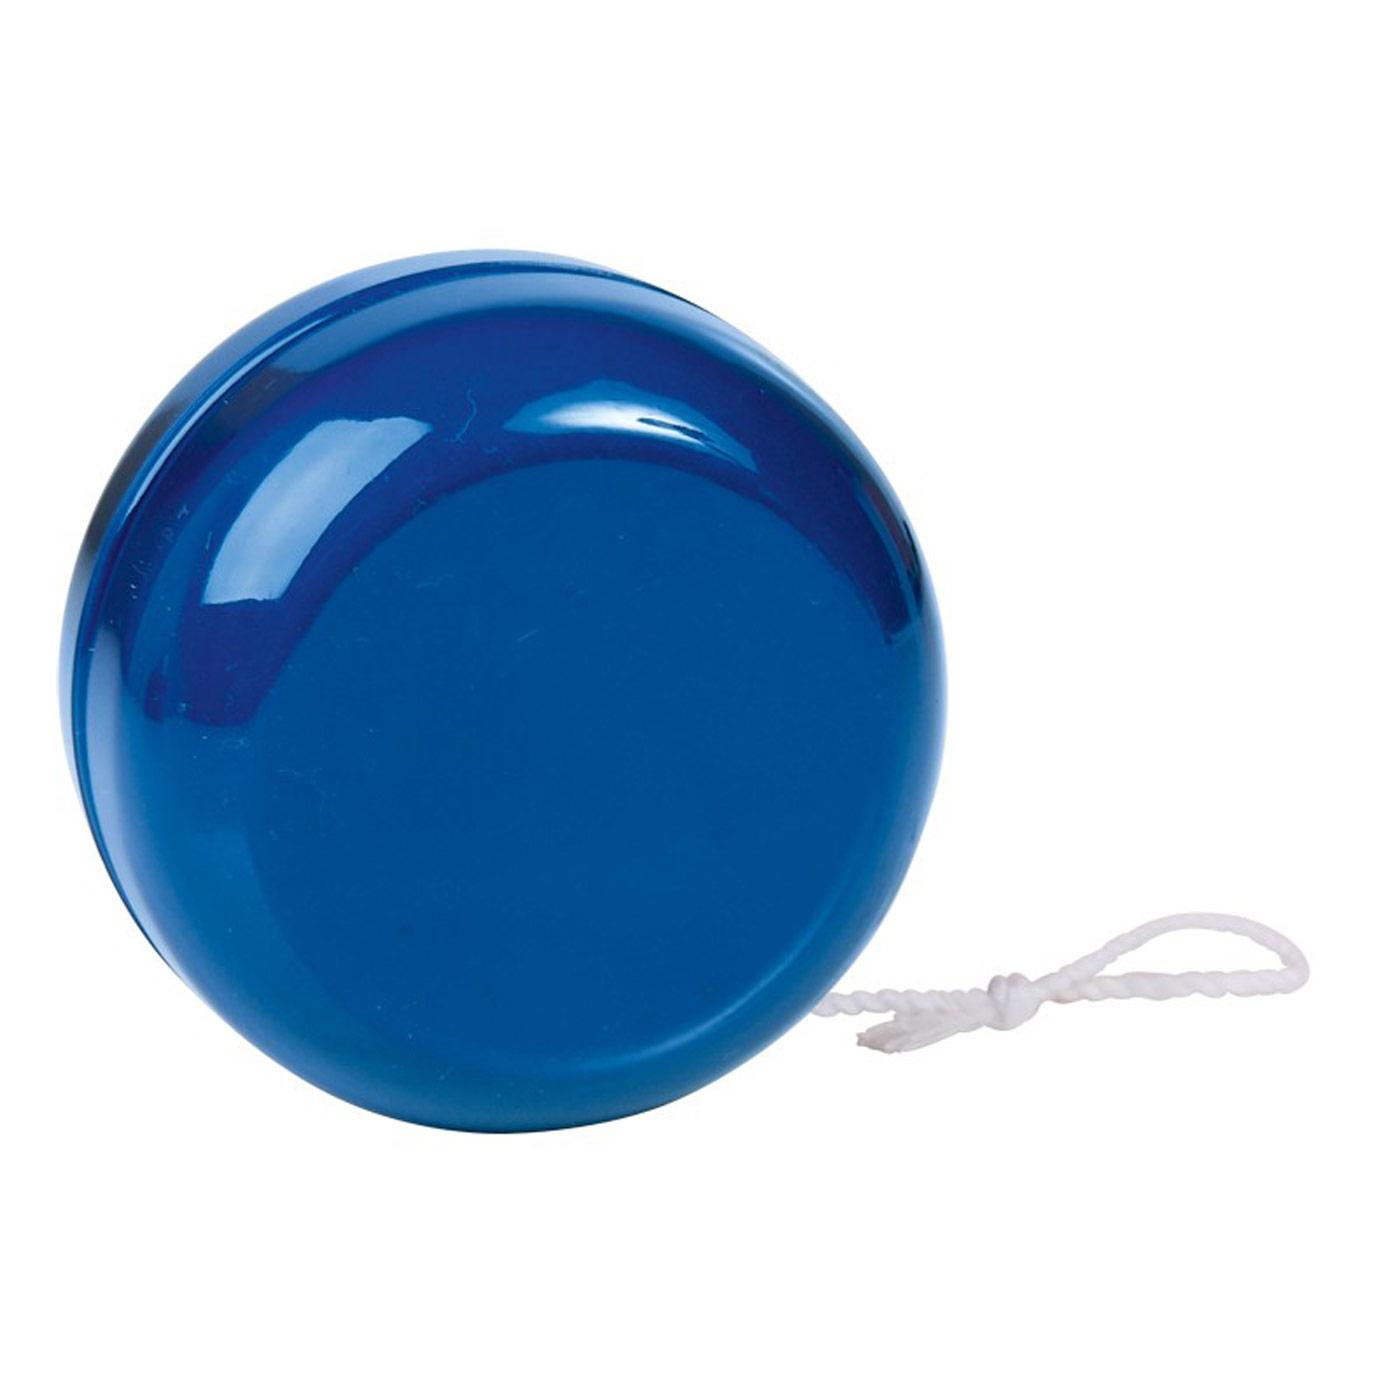 Ty401 blu ab prime item 6